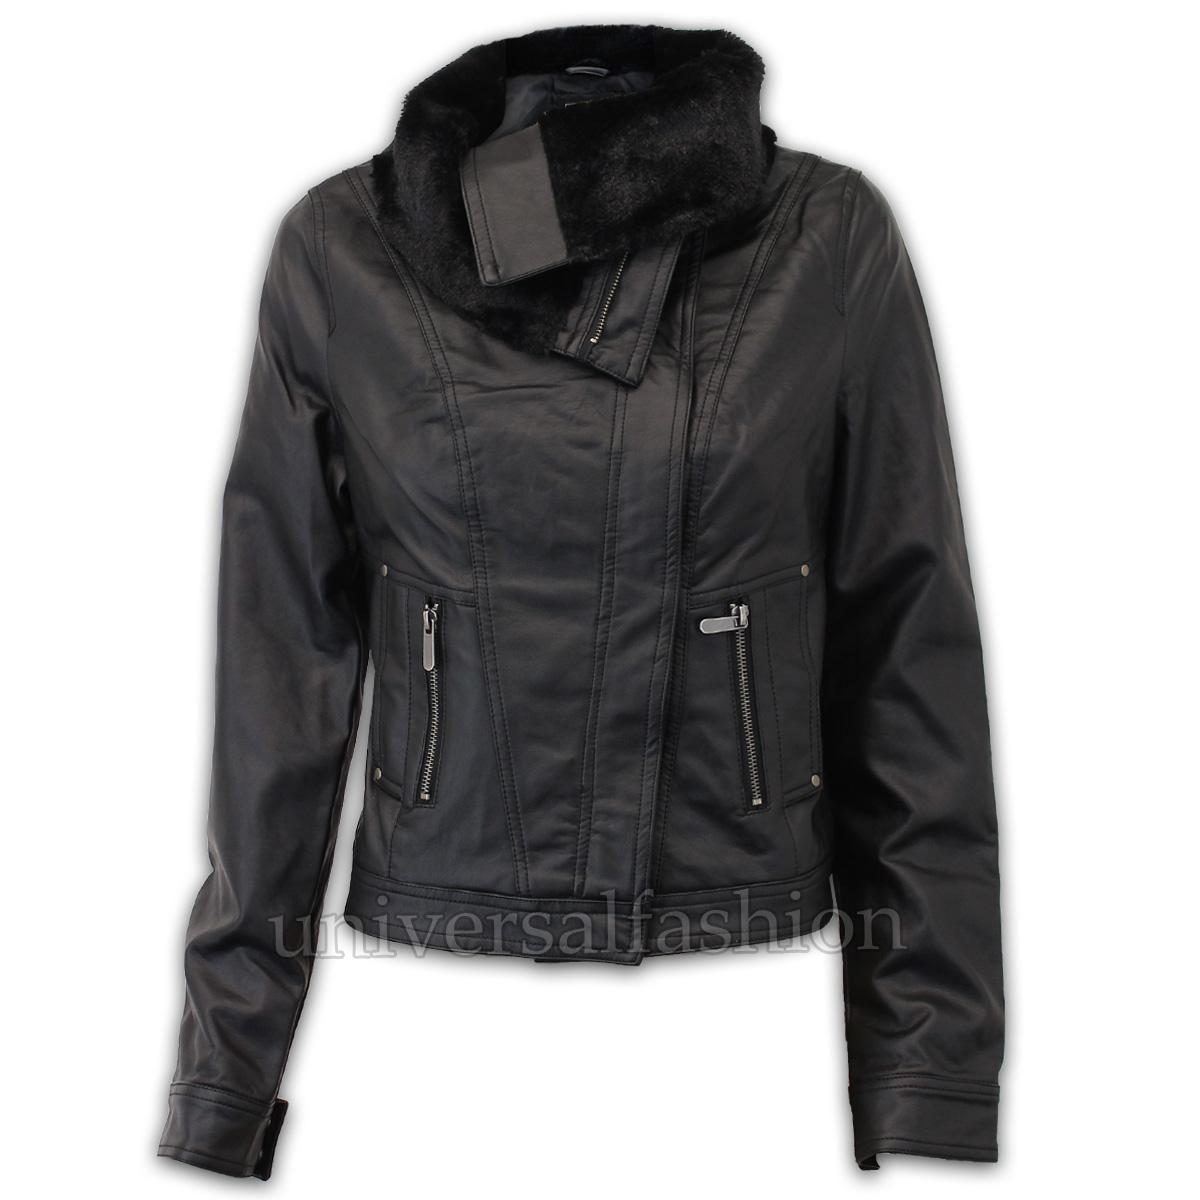 Ladies-Leather-Look-Biker-Jacket-Brave-Soul-Womens-Fur-Coat-Cropped-Lined-Casual